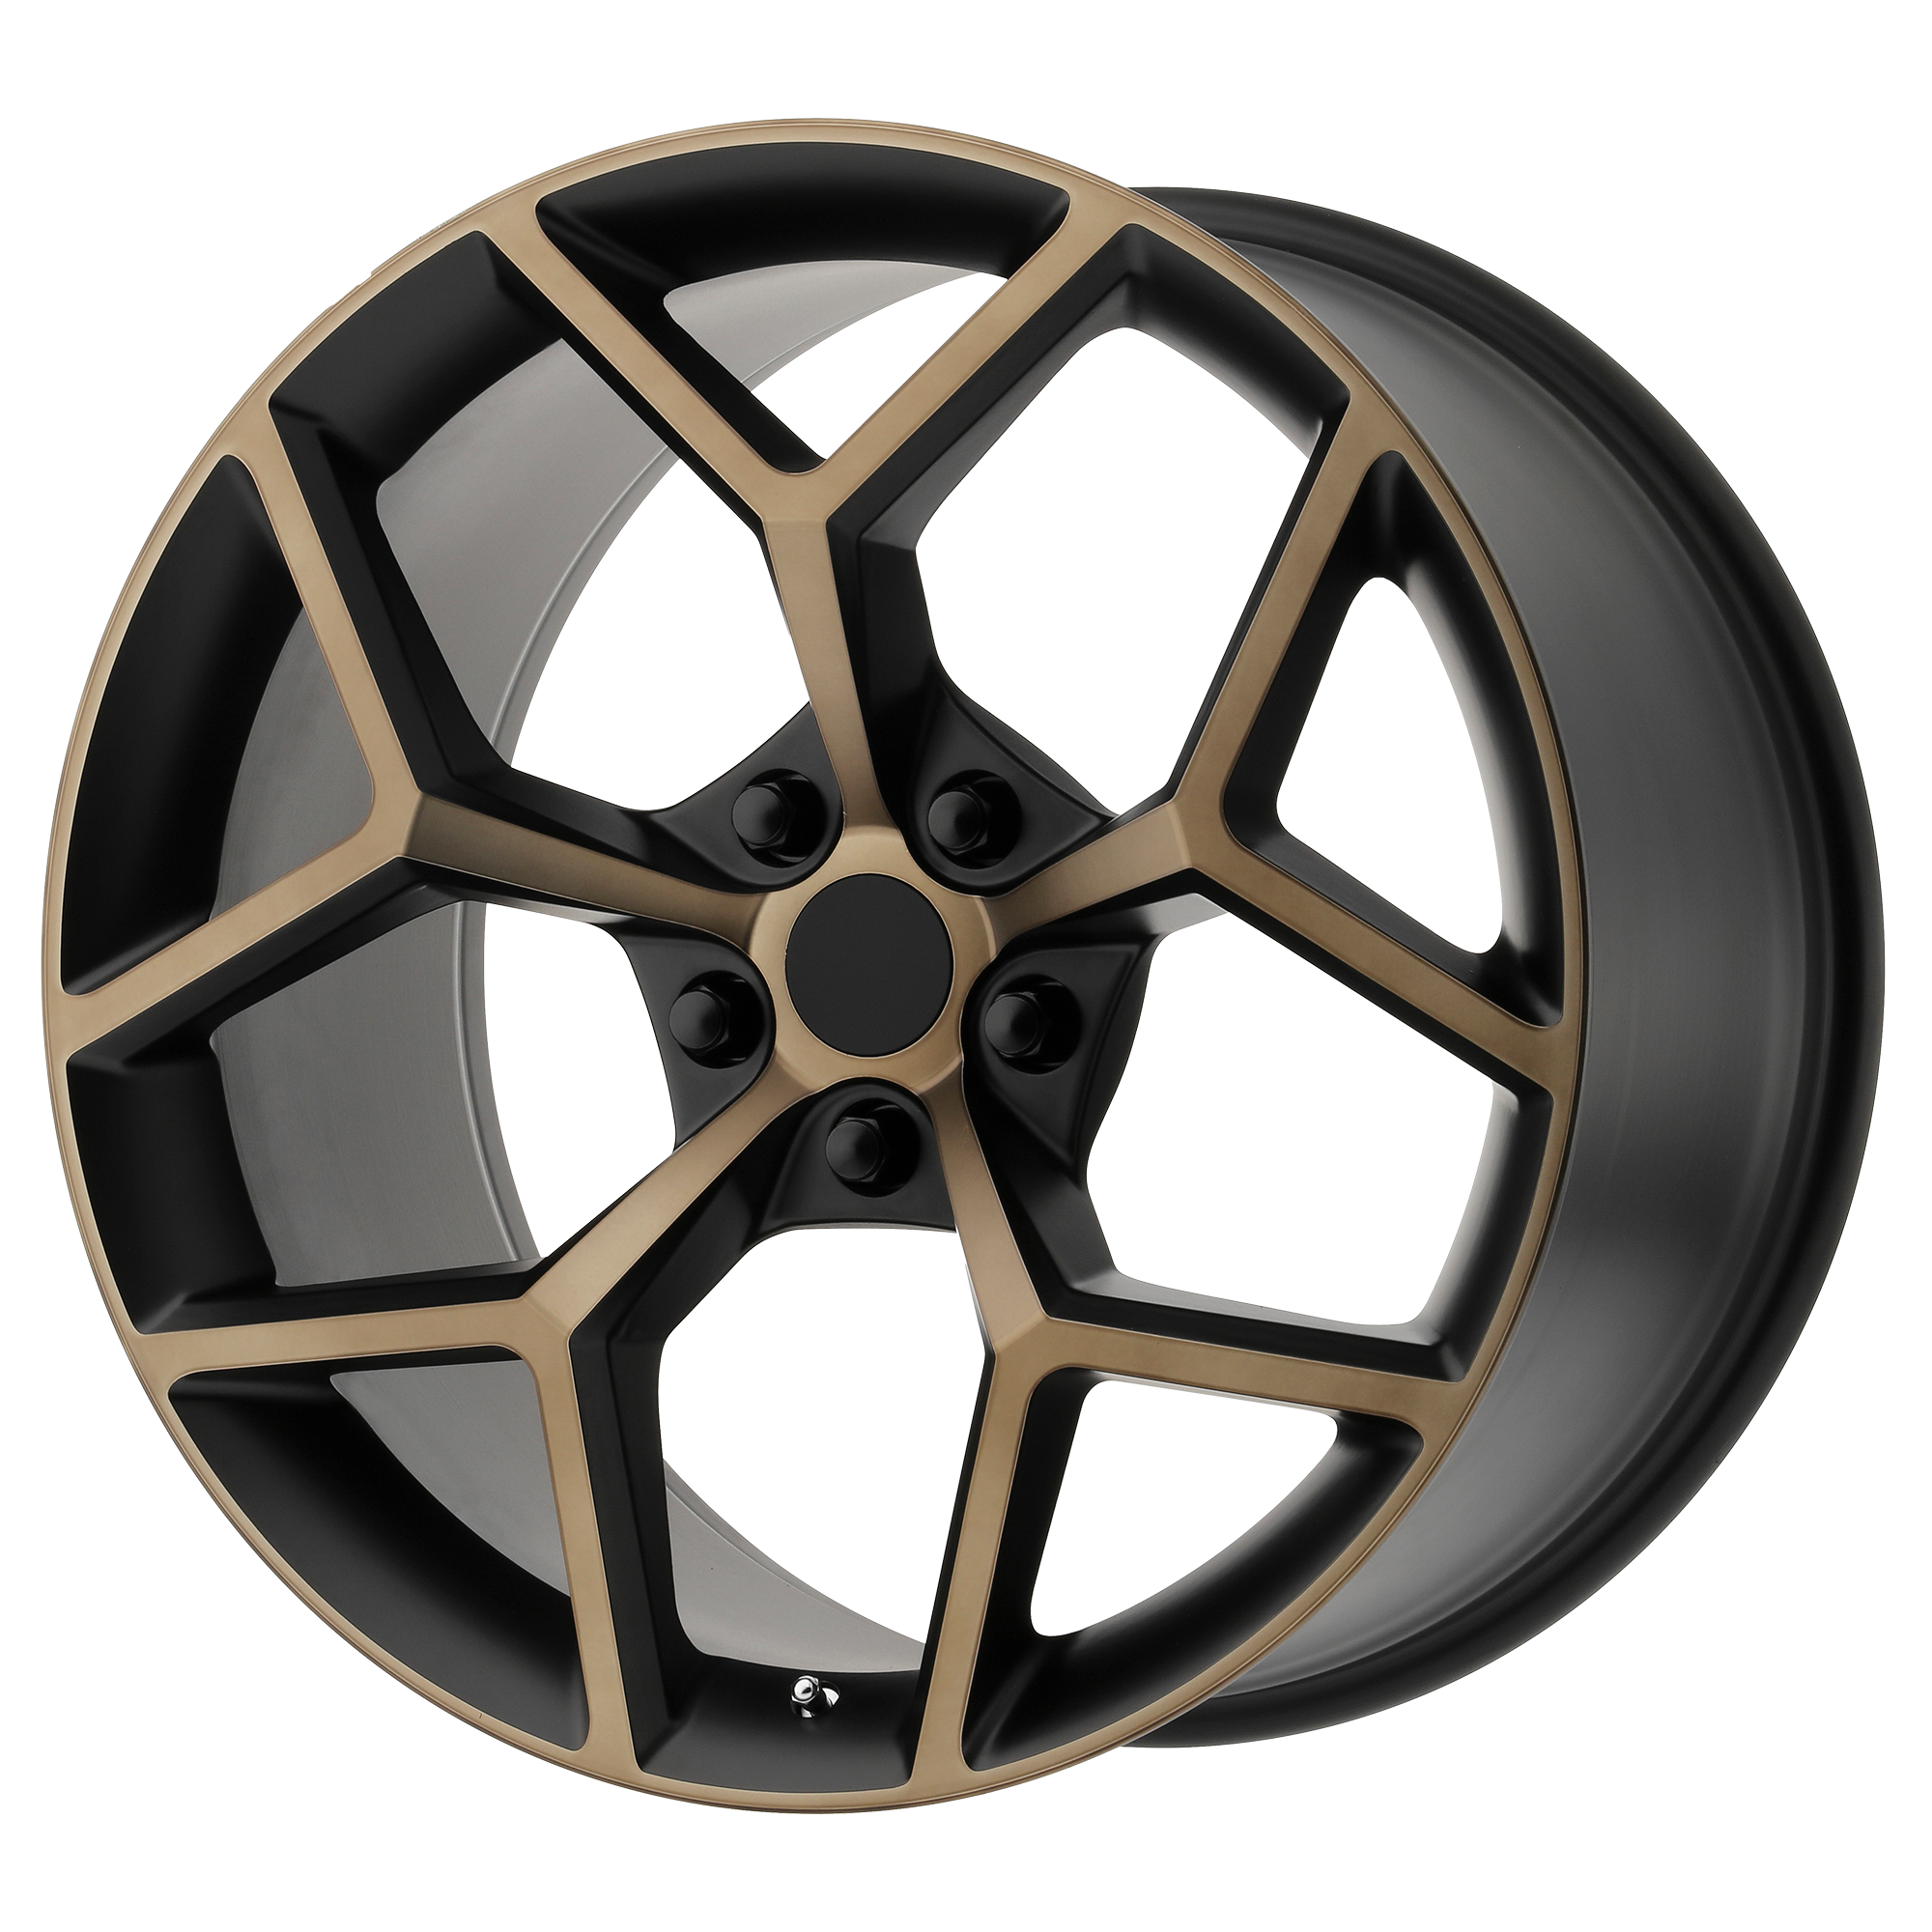 OE Creations Replica Wheels OE Creations PR126 Black/Bronze